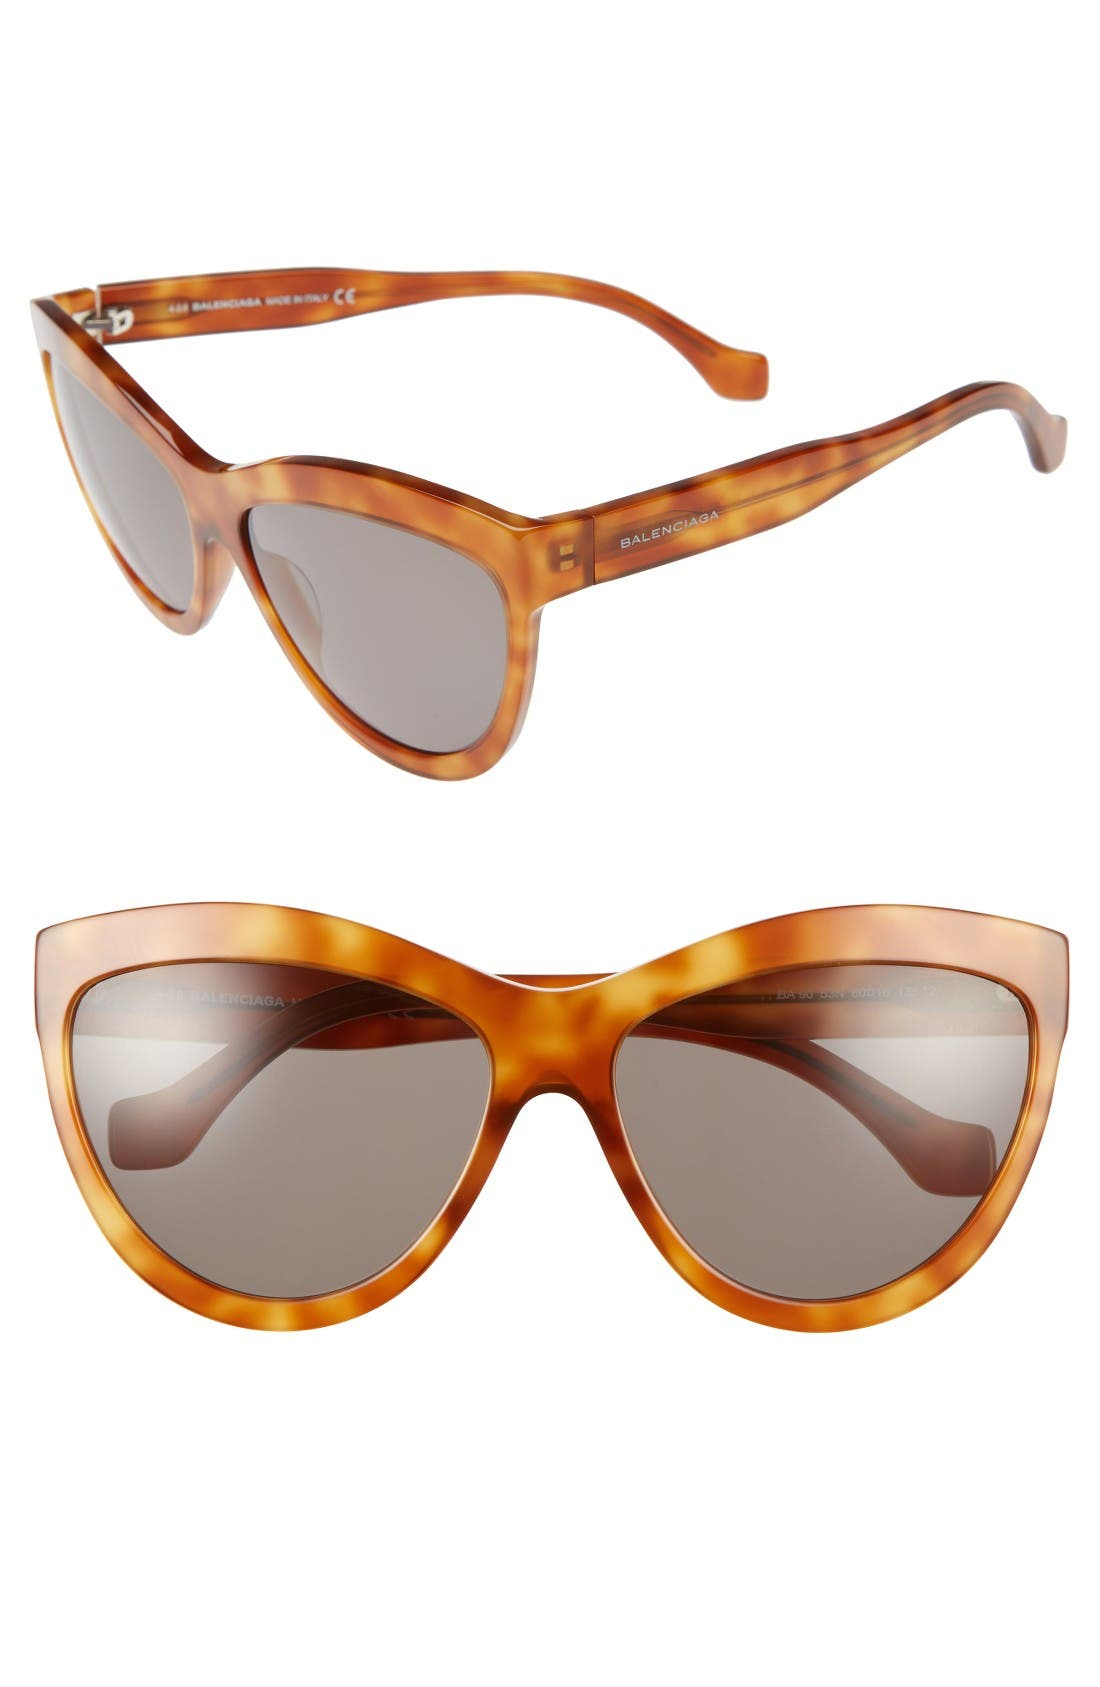 Balenciaga Monochromatic Cat-Eye Sunglasses, Light Brown